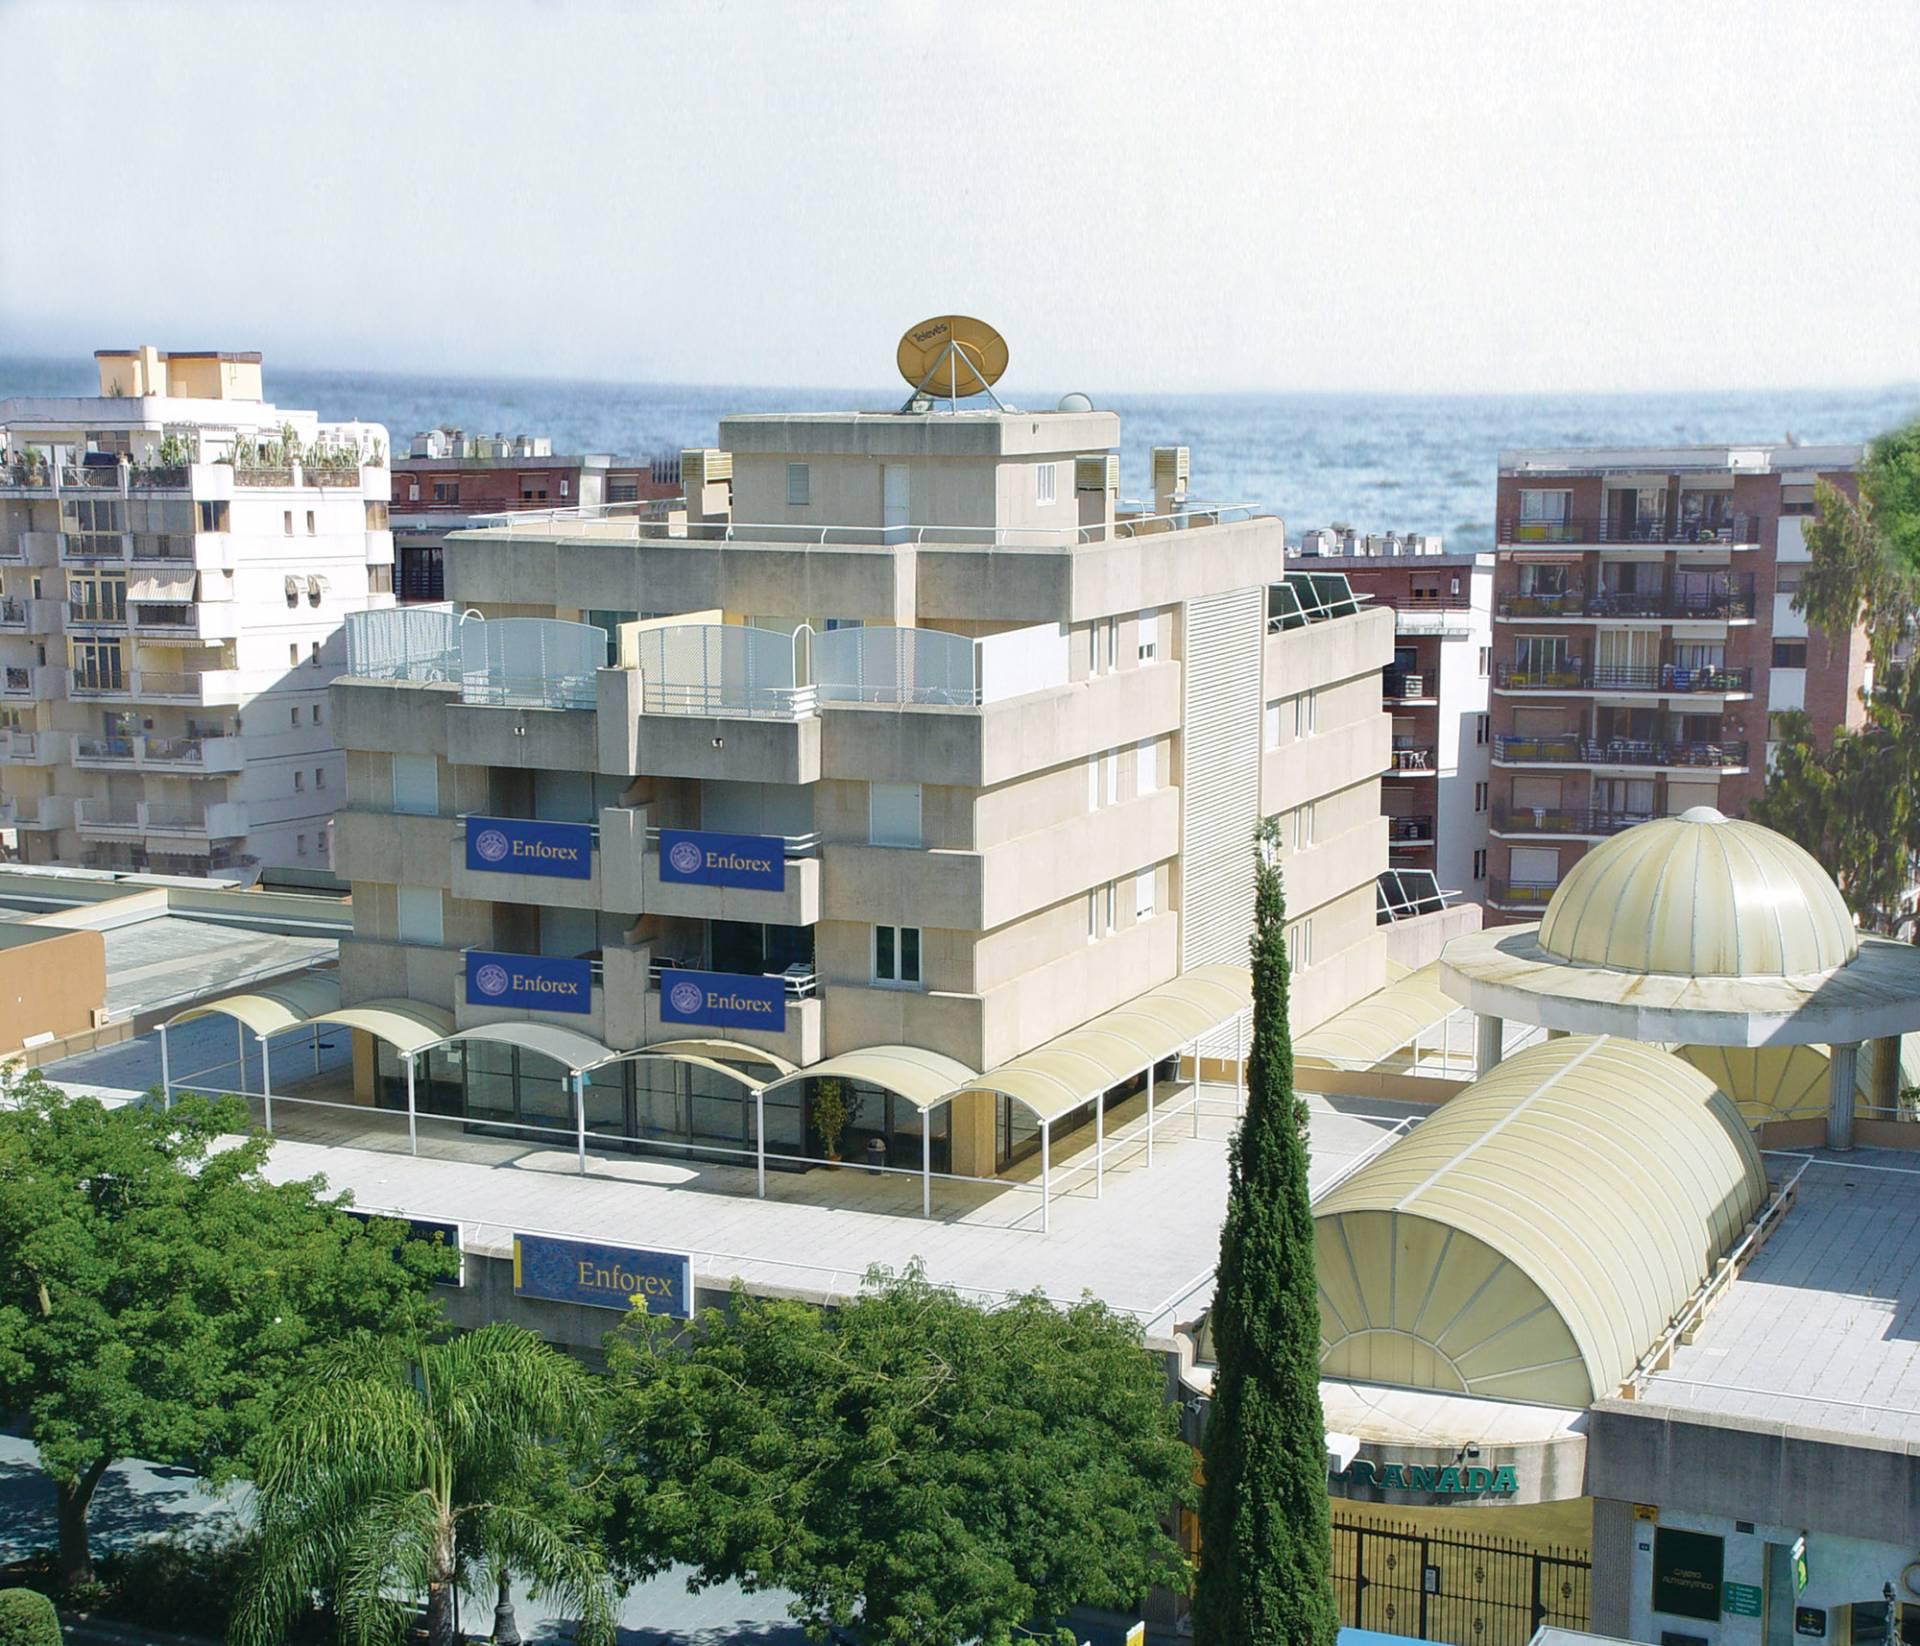 Enforex camp review - Salamanca Forum - Tripadvisor